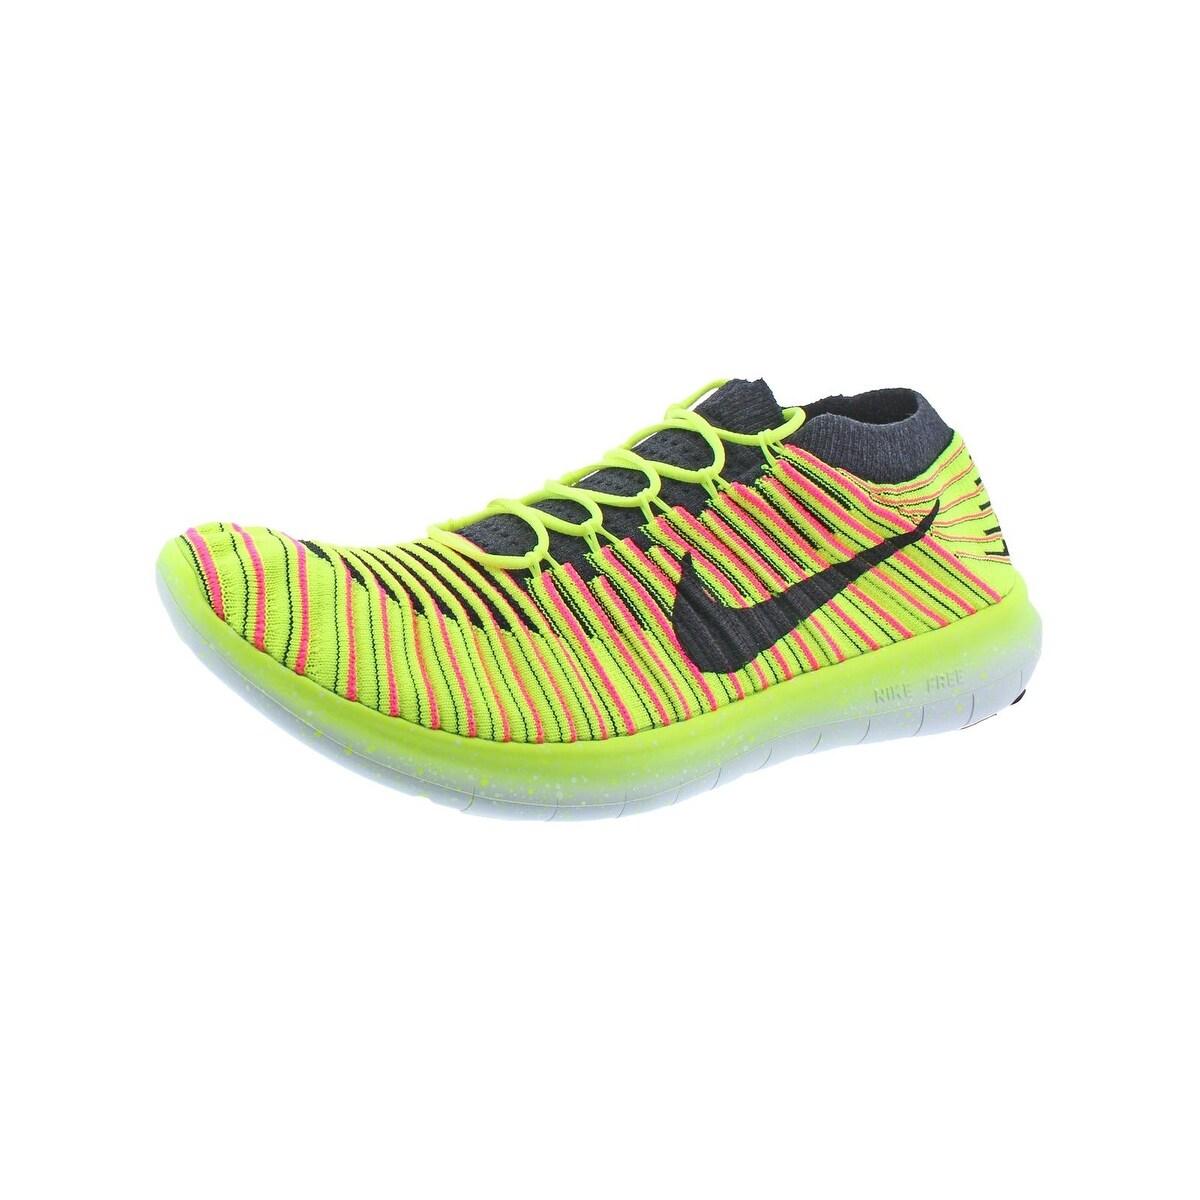 Flexibility Flyknit Air Max Nike Men Shoes Shoes